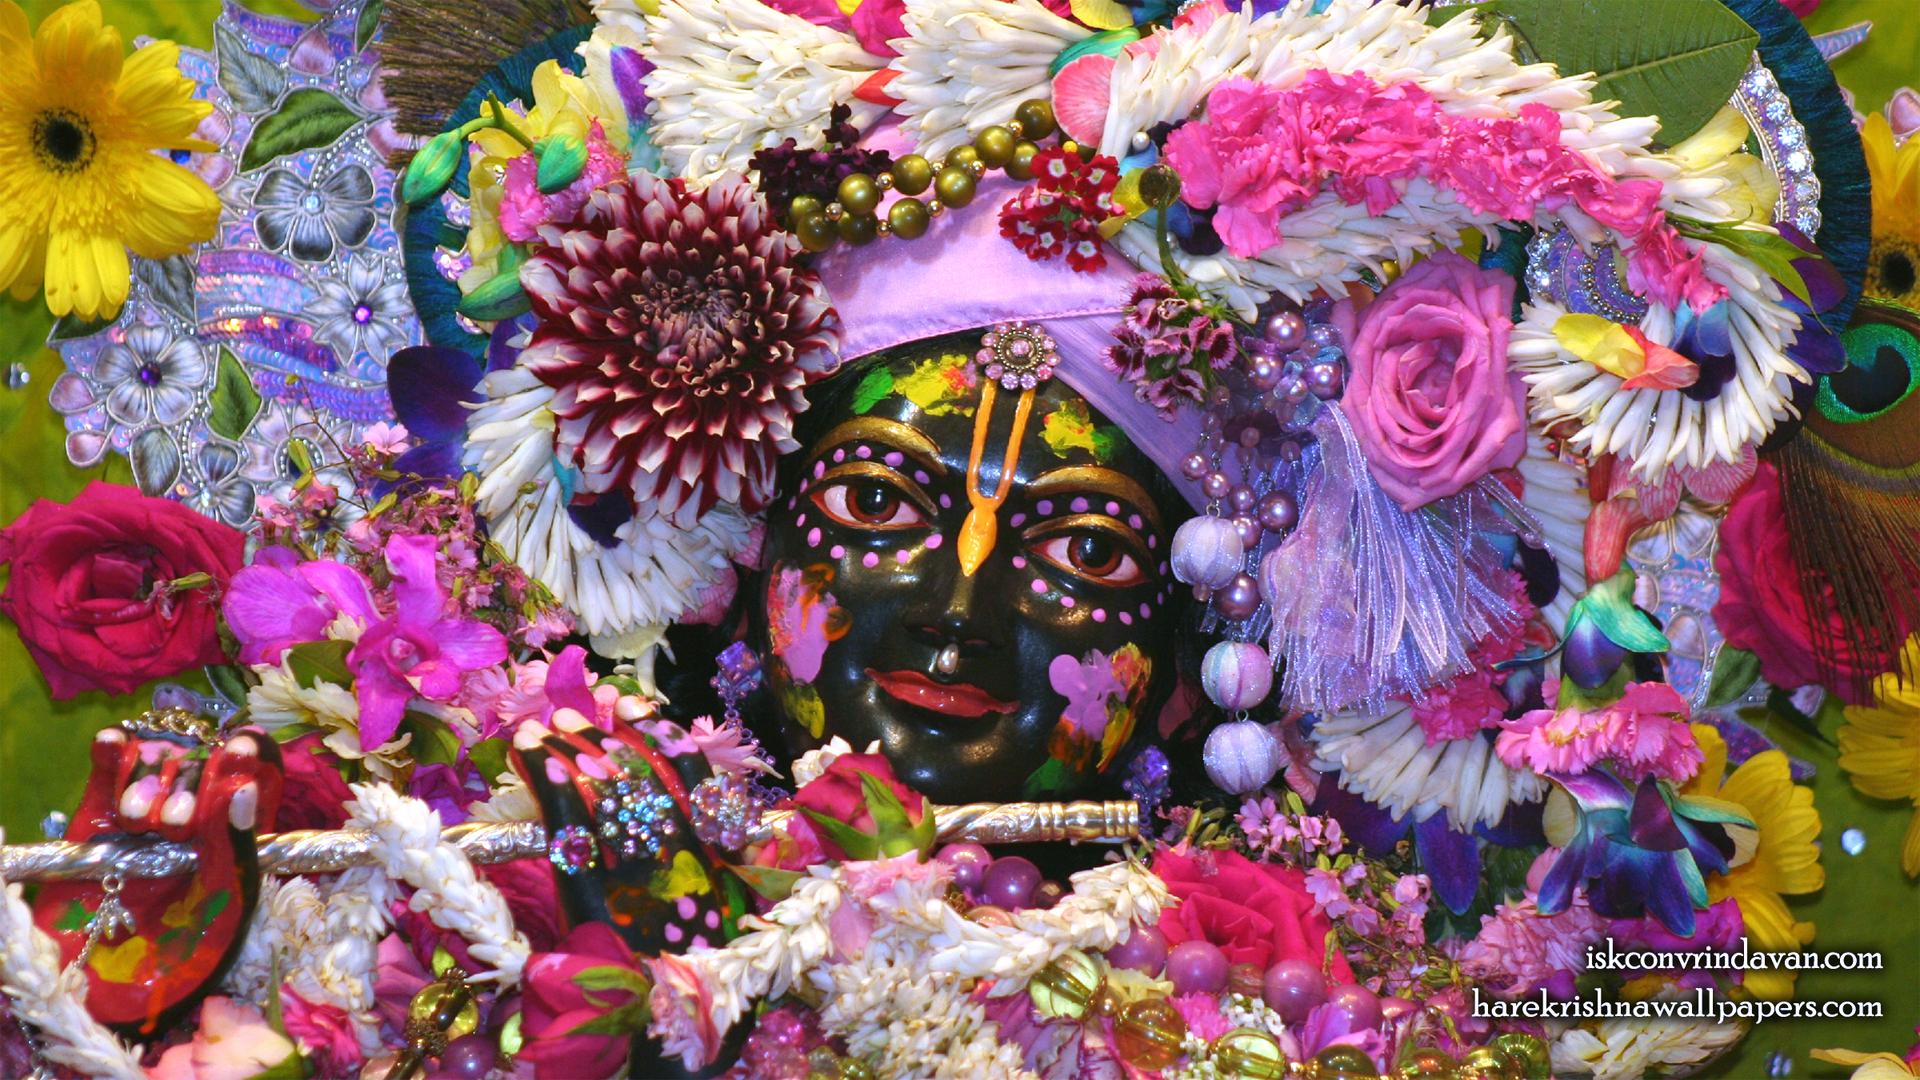 Sri Shyamsundar Close up Wallpaper (020) Size 1920x1080 Download